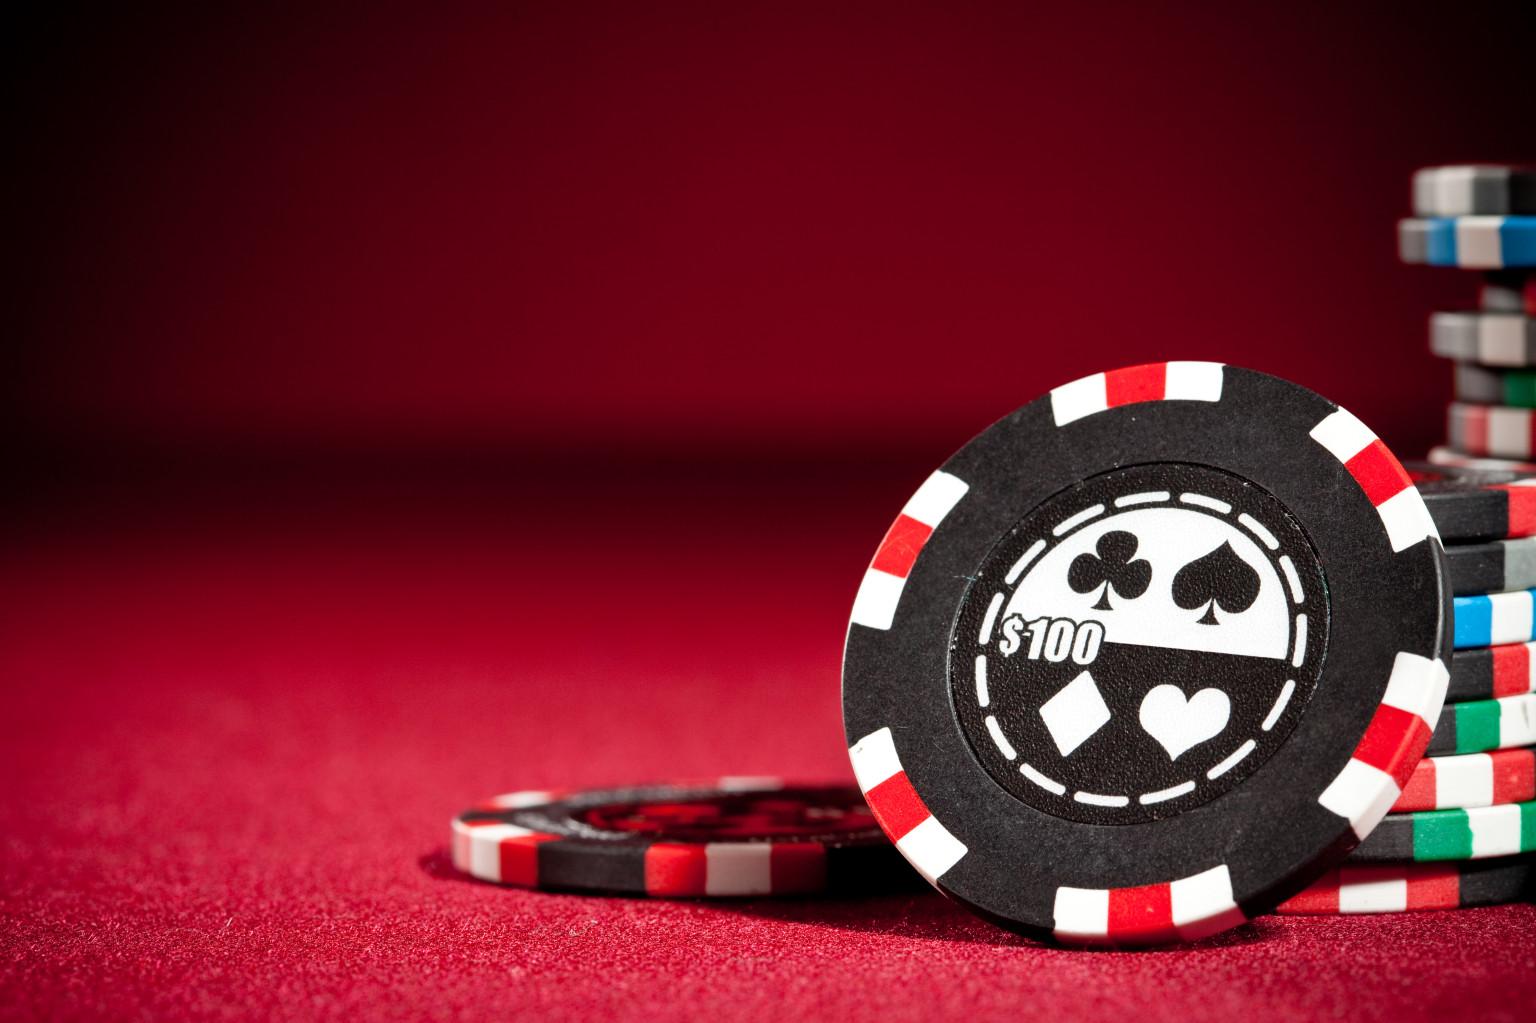 Jeux casino: osez jouer en ligne